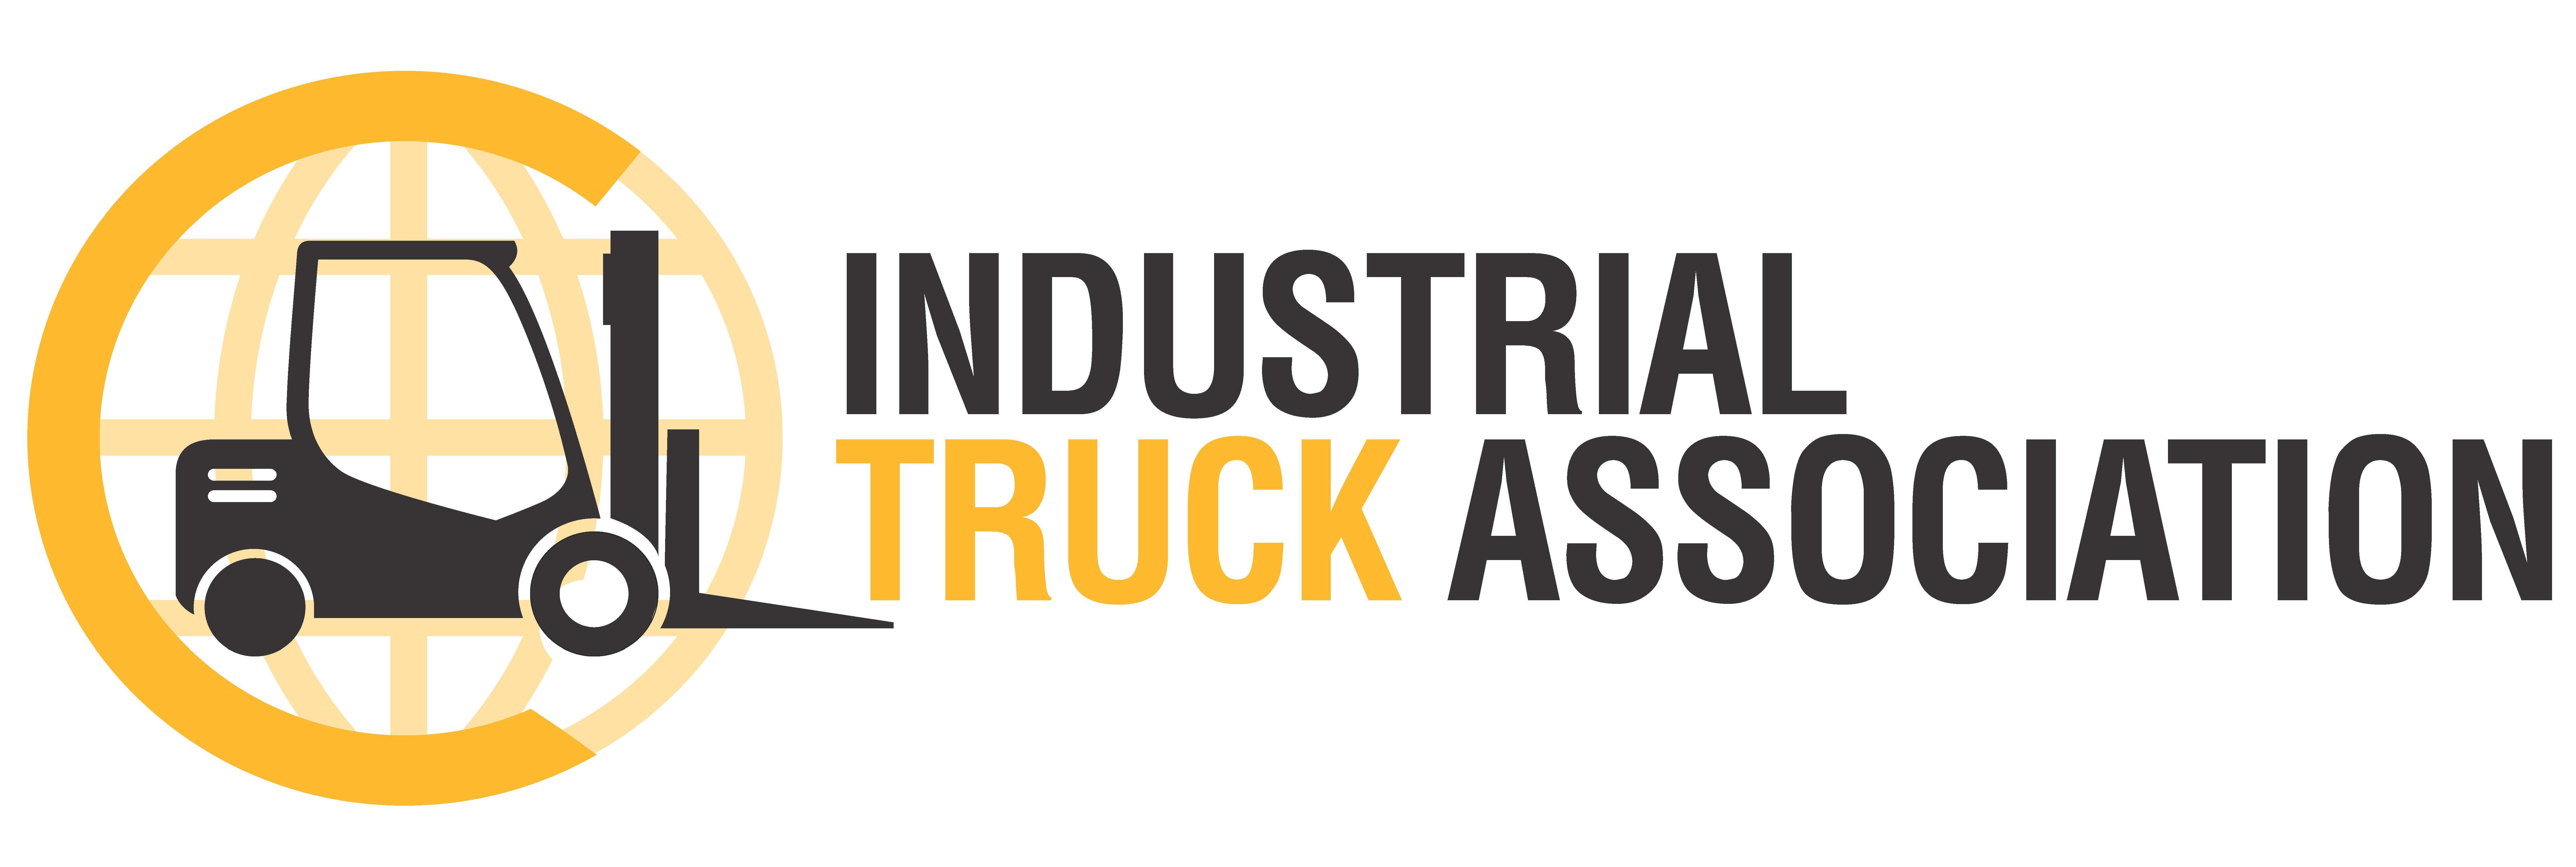 Industrial Truck Association